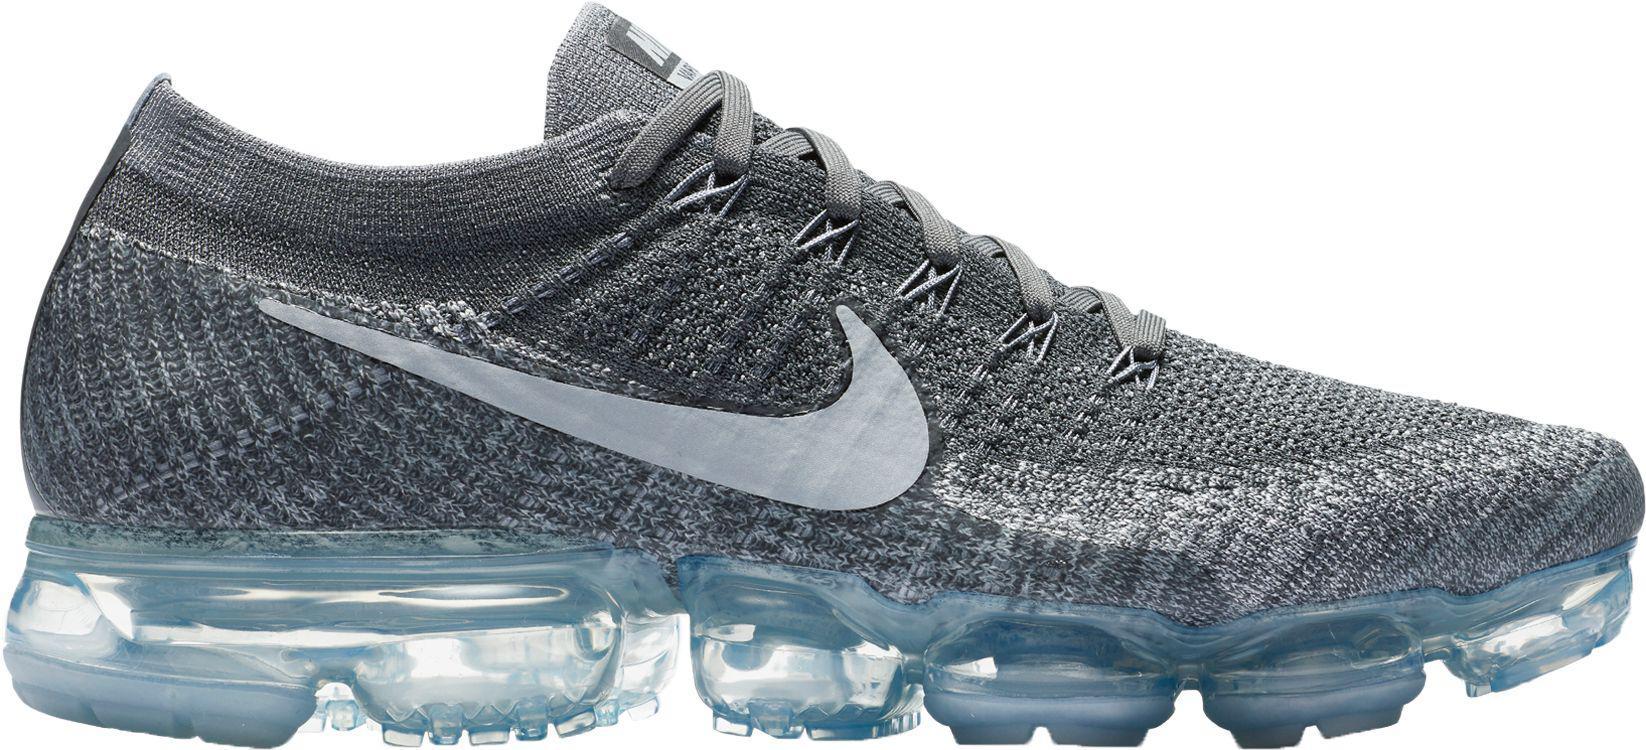 Nike - Gray Air Vapormax Flyknit Running Shoes for Men - Lyst